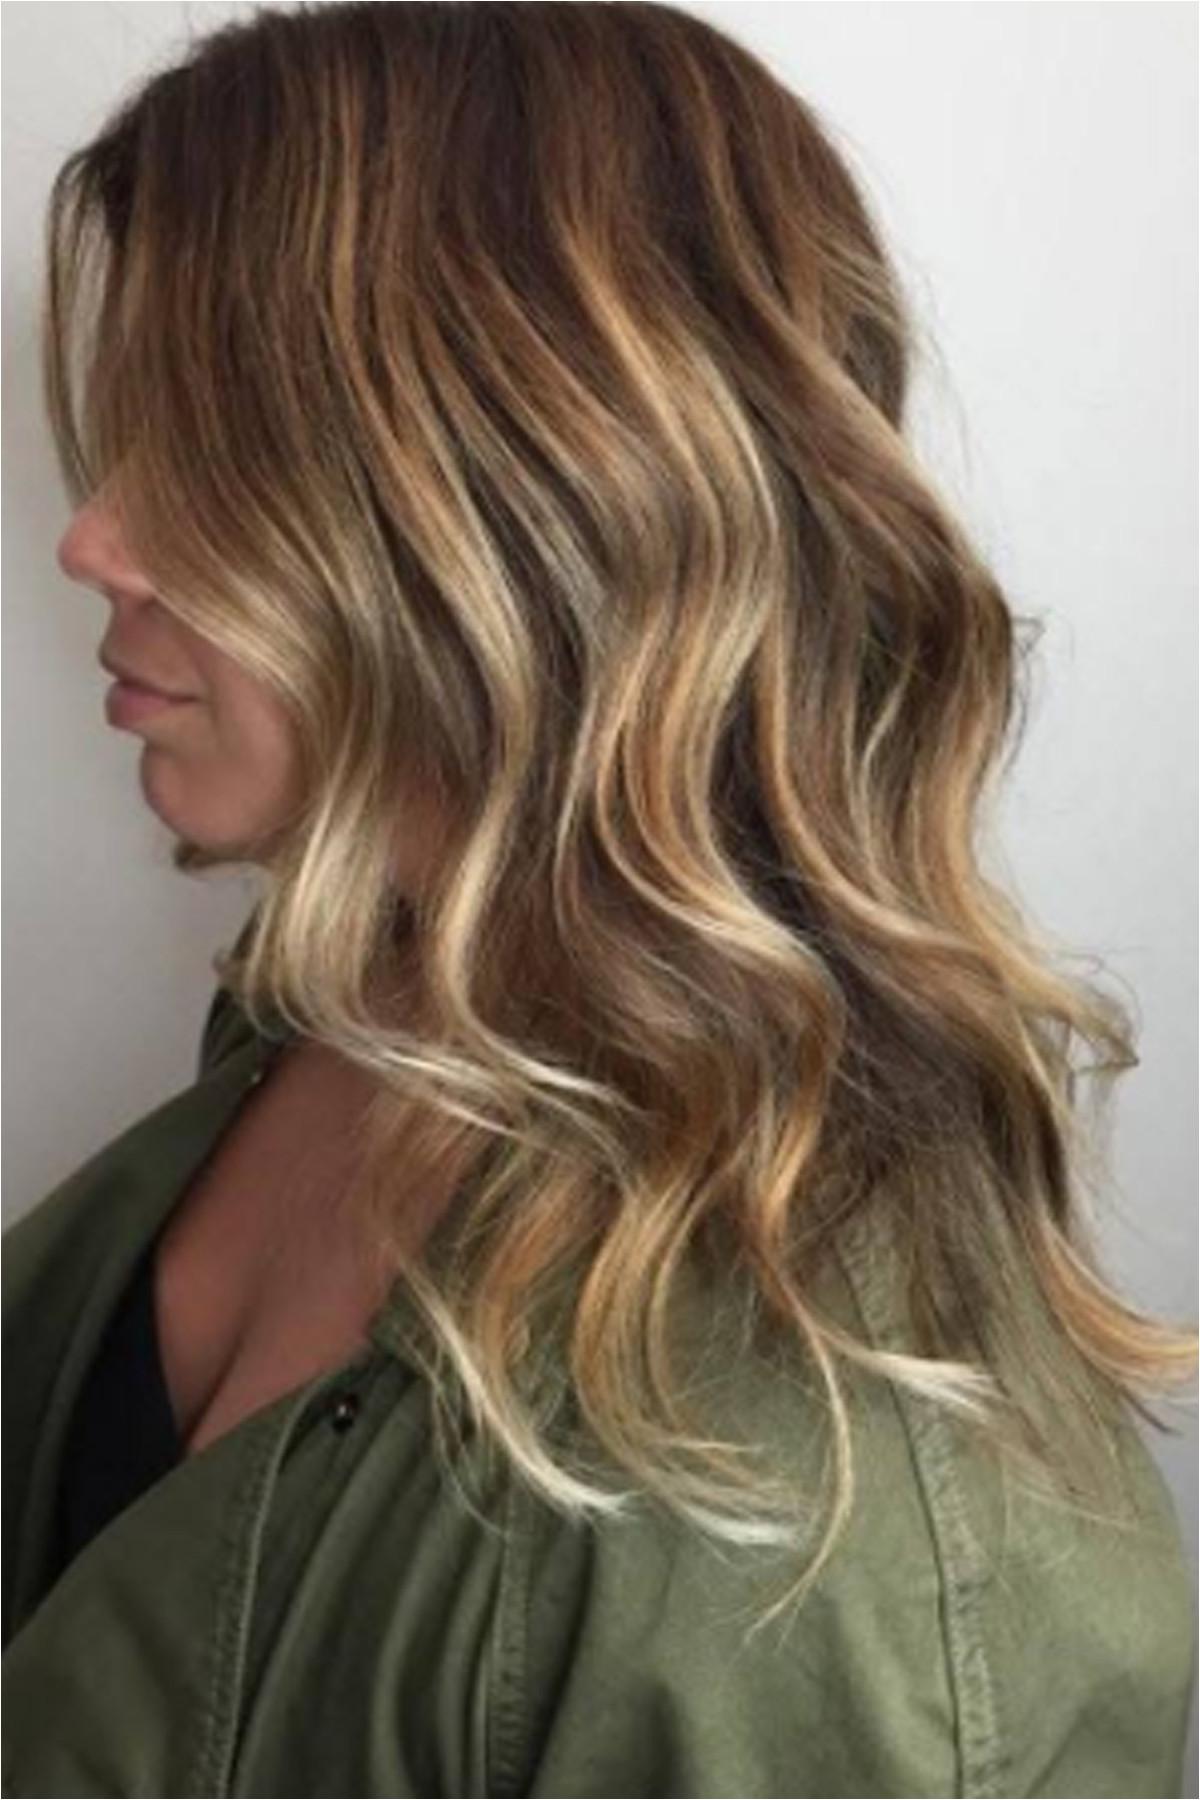 Tiger Eyewomansday 2018 Hair Color Trends Hair Color 2018 Fall Hair Colors Hair